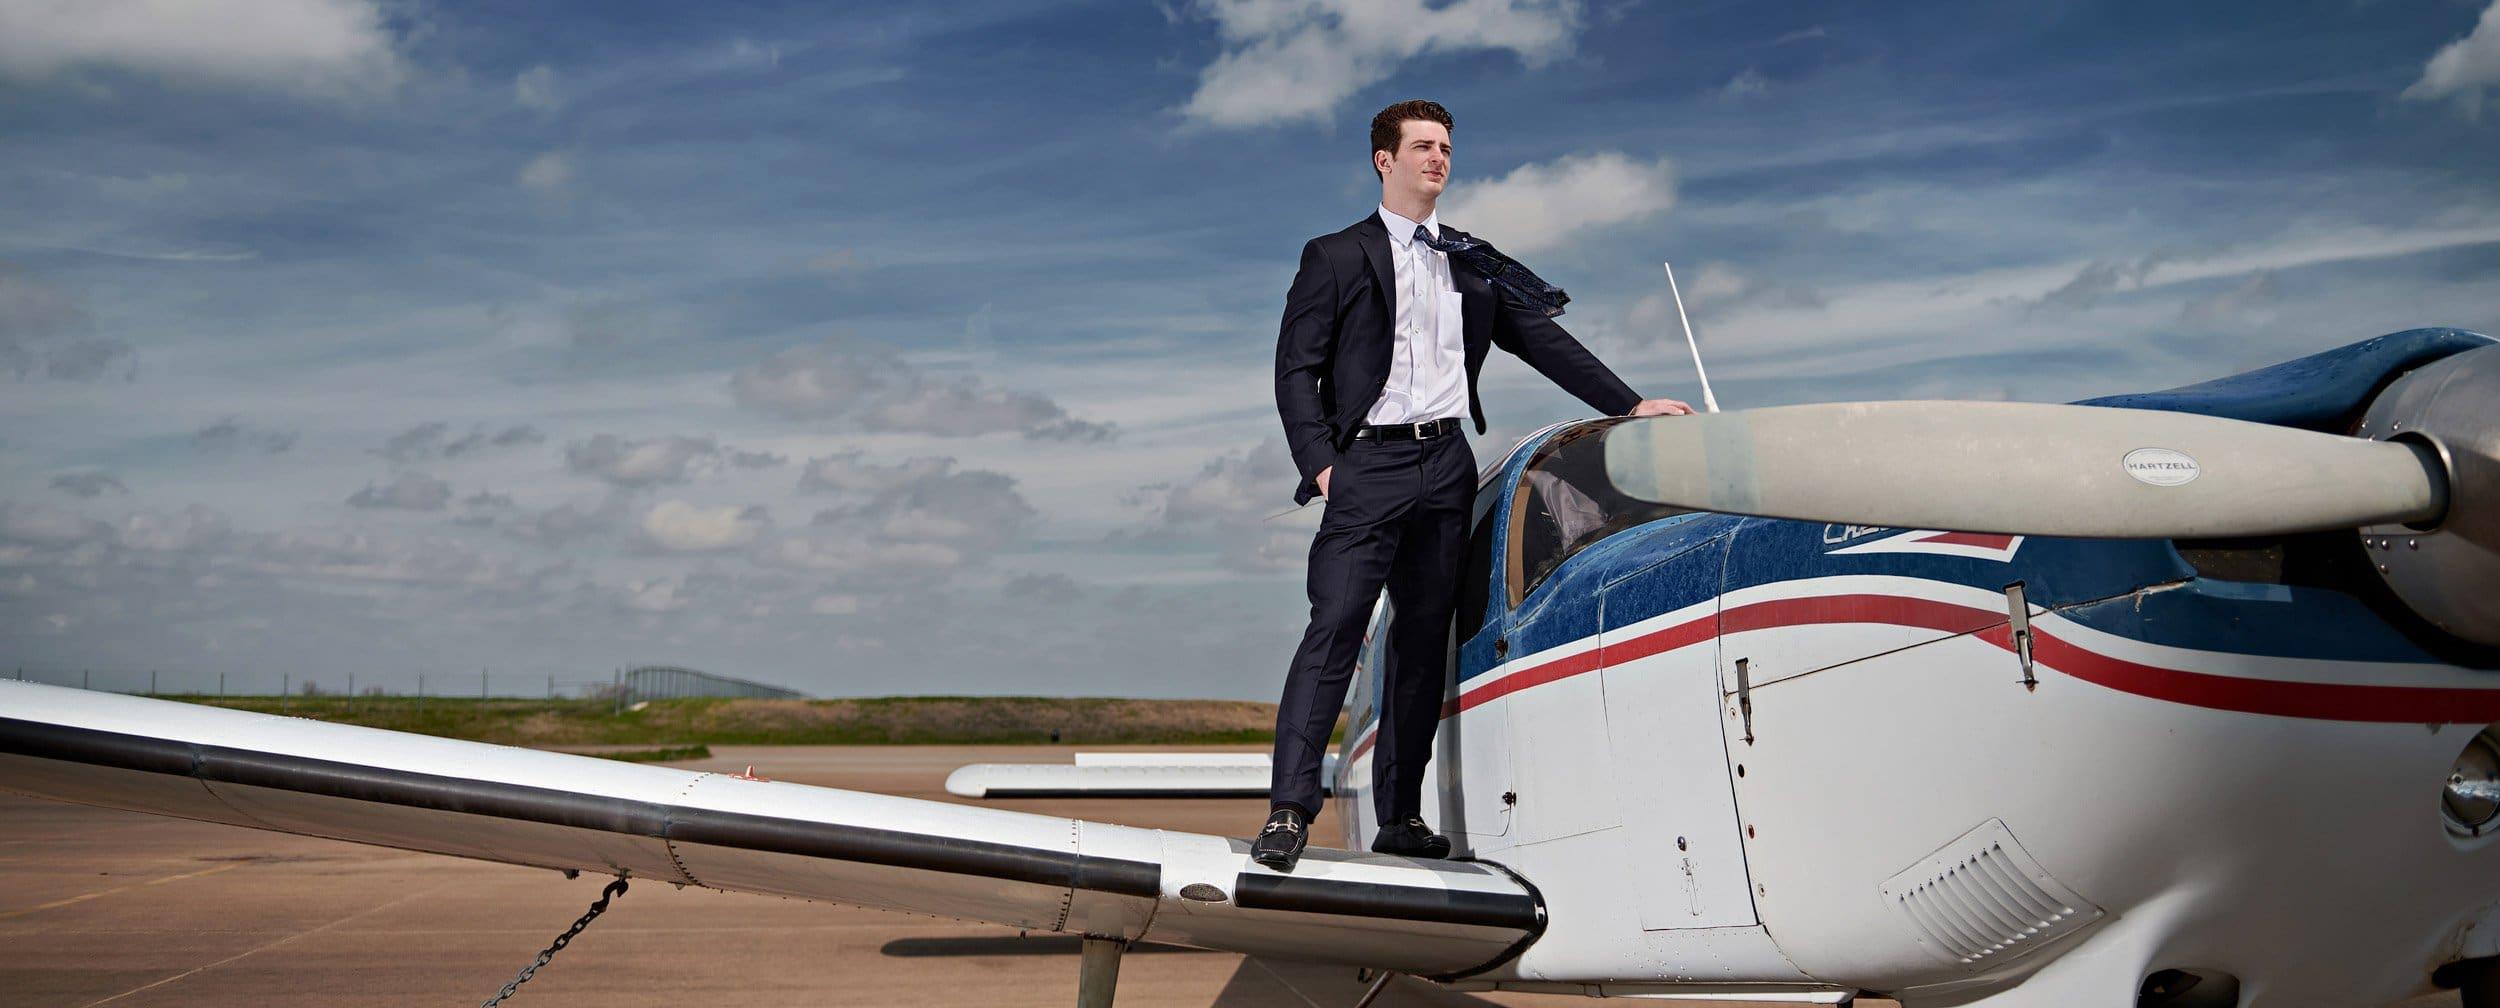 prosper senior photographer student on plane wing for portraits in suit banner